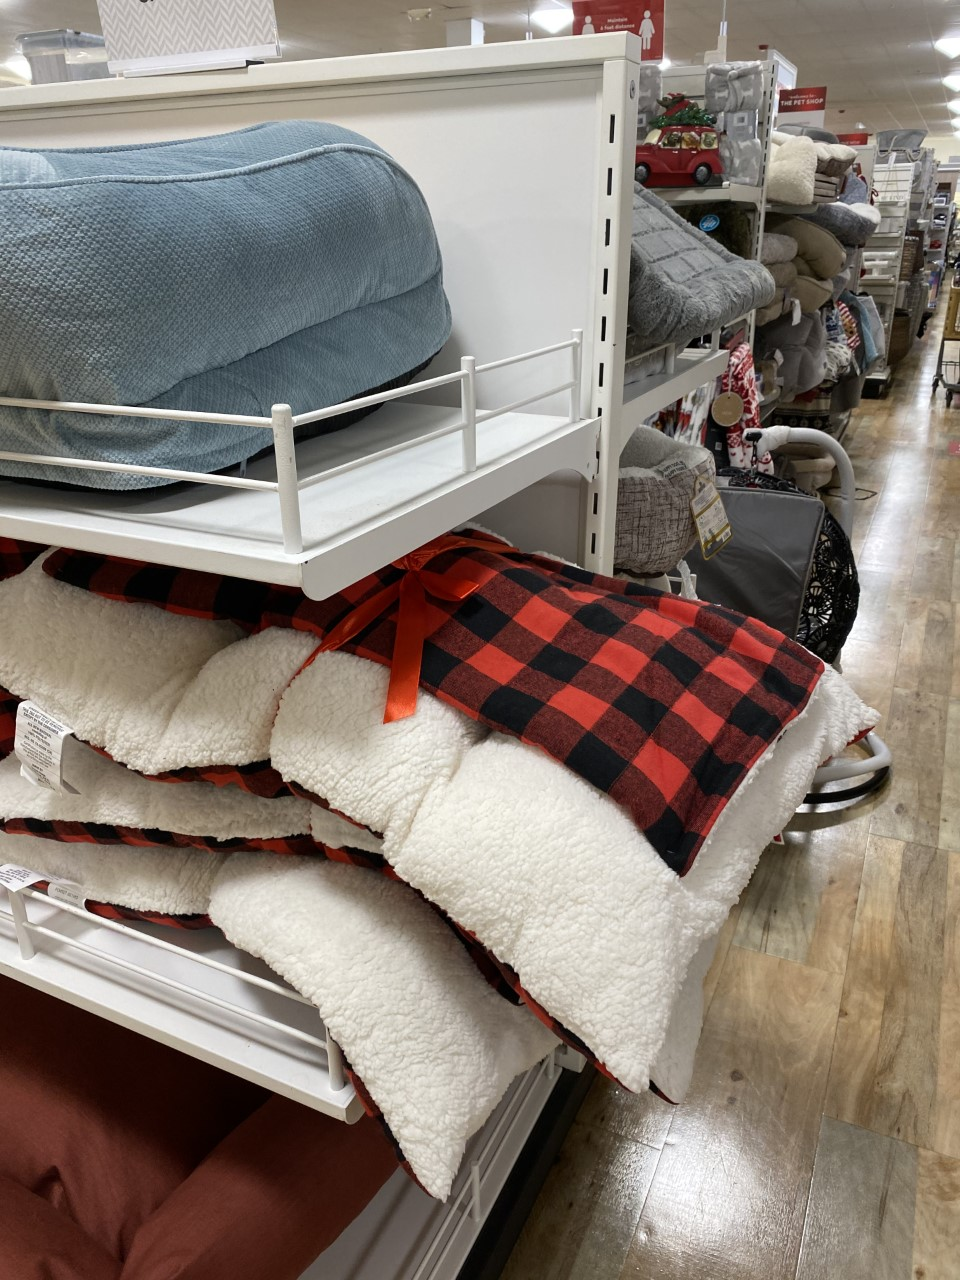 Home Goods Bed Frames : goods, frames, Goods, Beds,, Like,, Boing